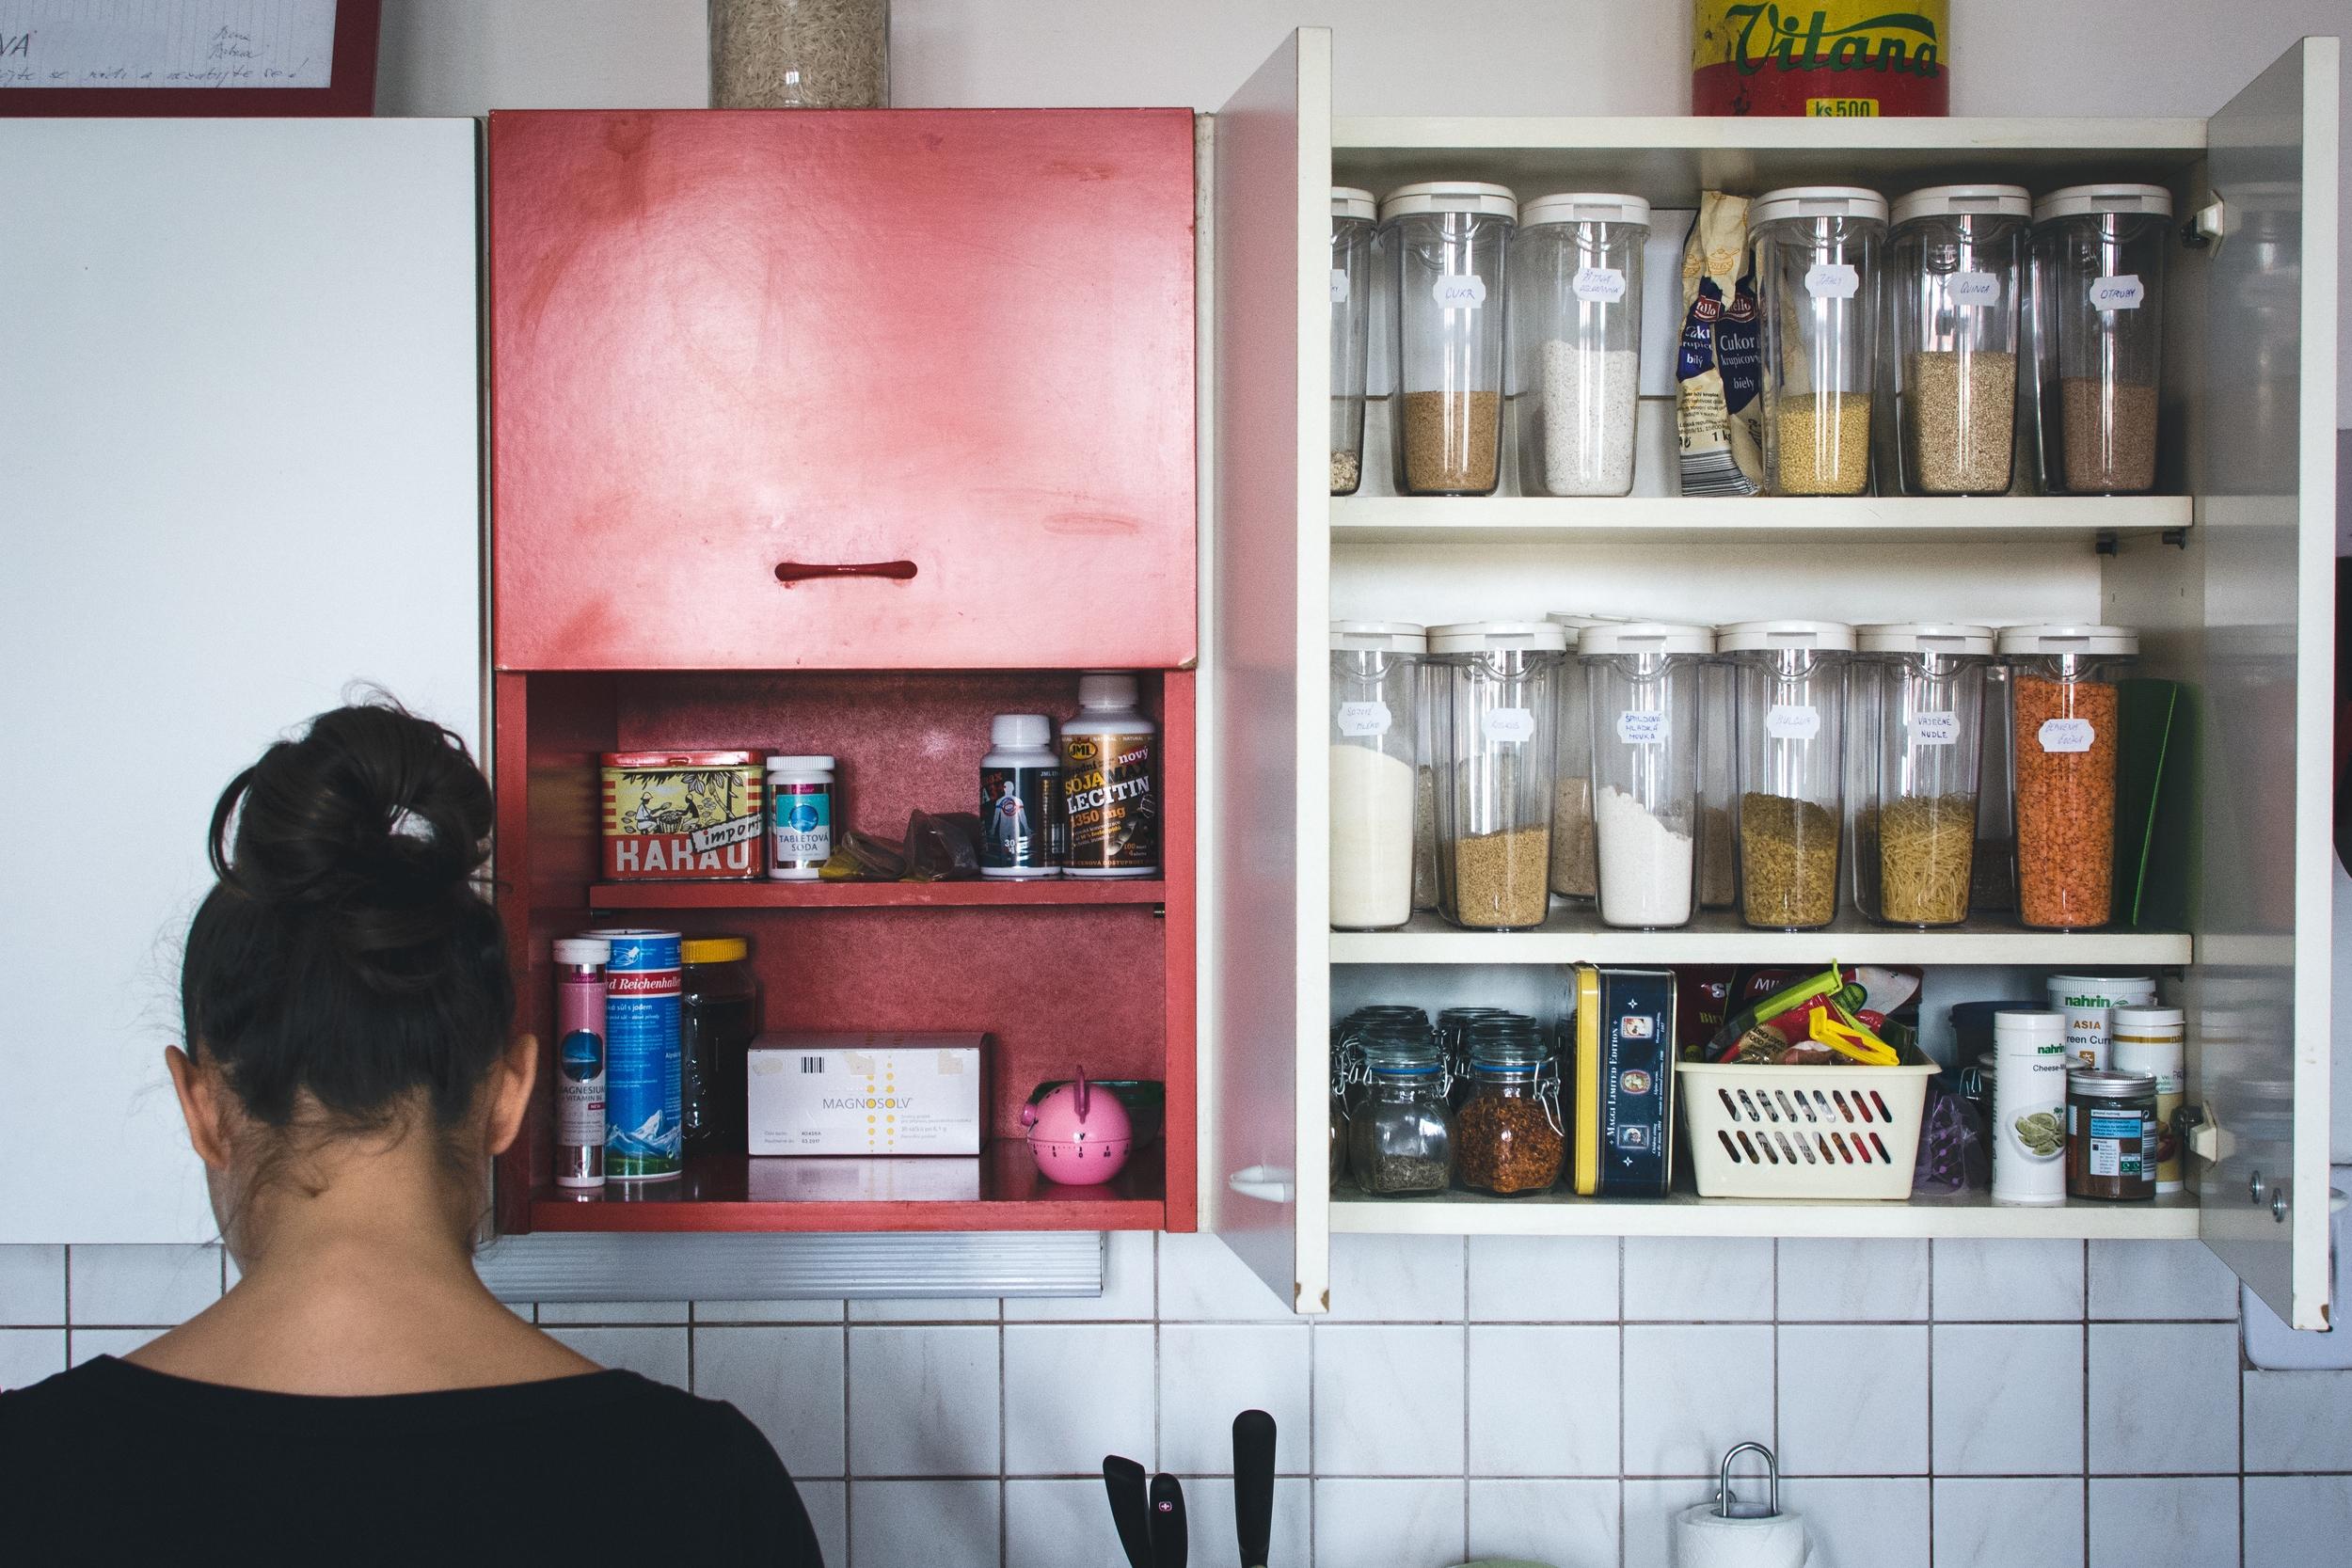 Cabinet Pantry_foodiesfeed.com_home-vintage-kitchen.jpg